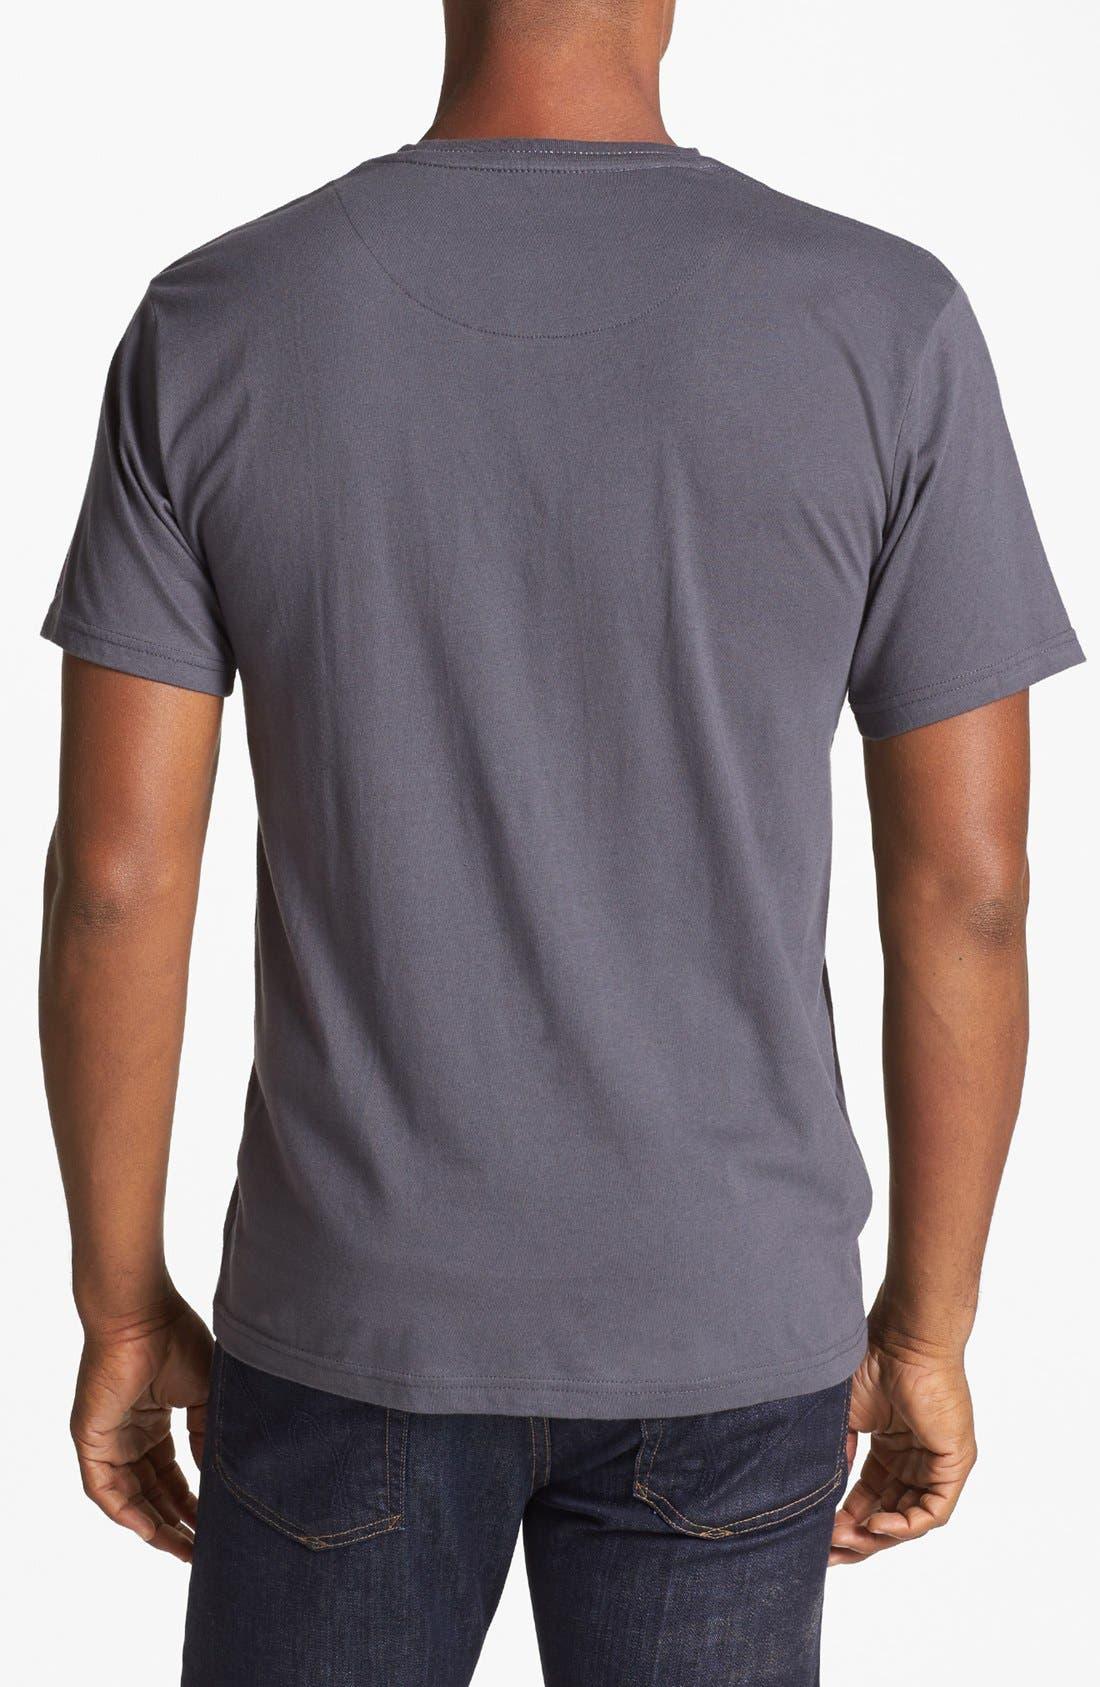 Alternate Image 2  - Mitchell & Ness 'San Antonio Spurs' T-Shirt